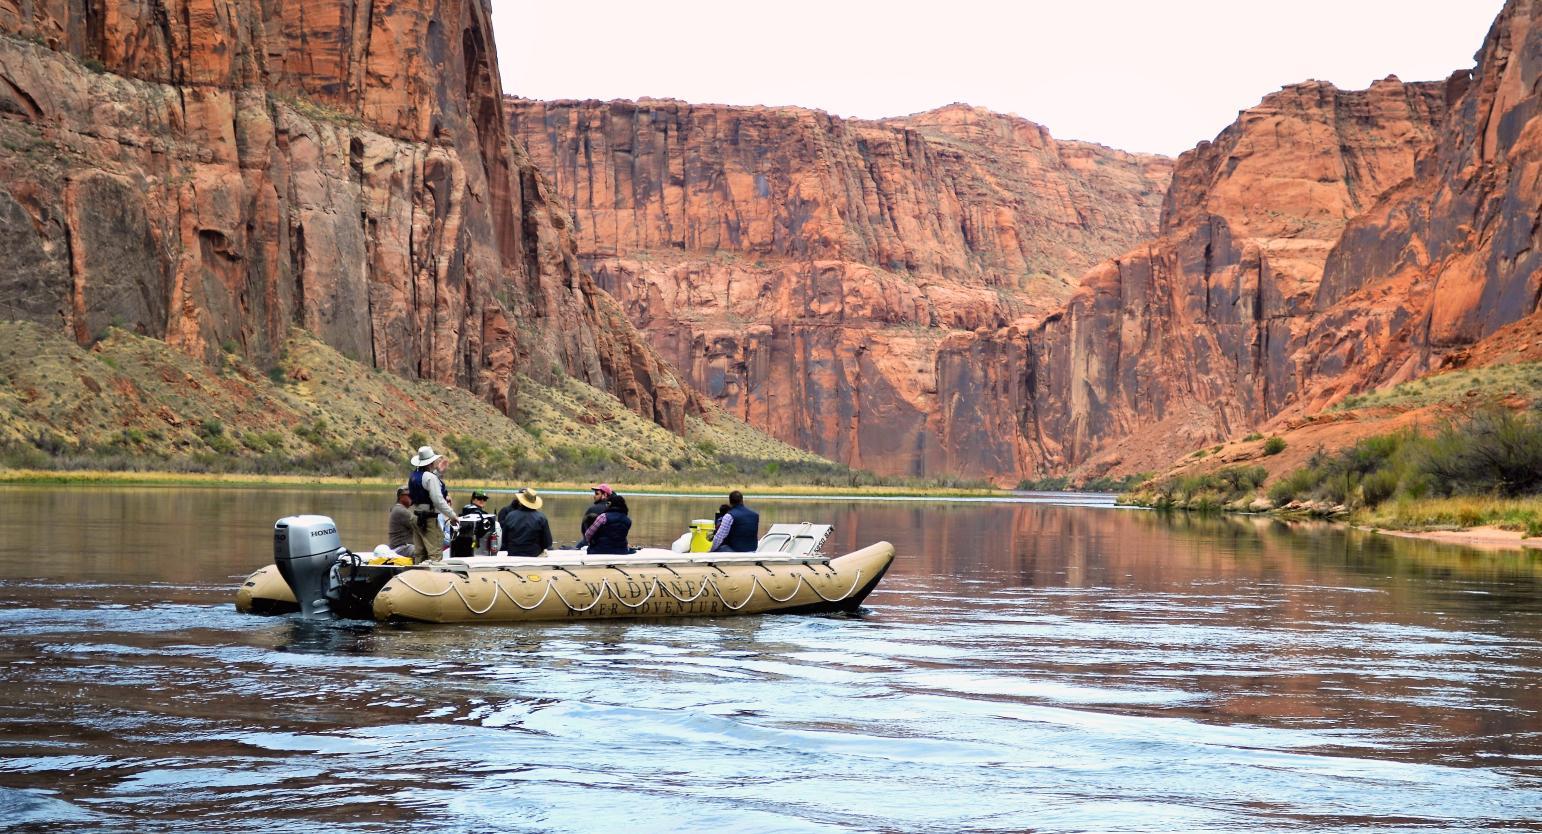 RS9602_DSC_9920-passengers-on-river-raft